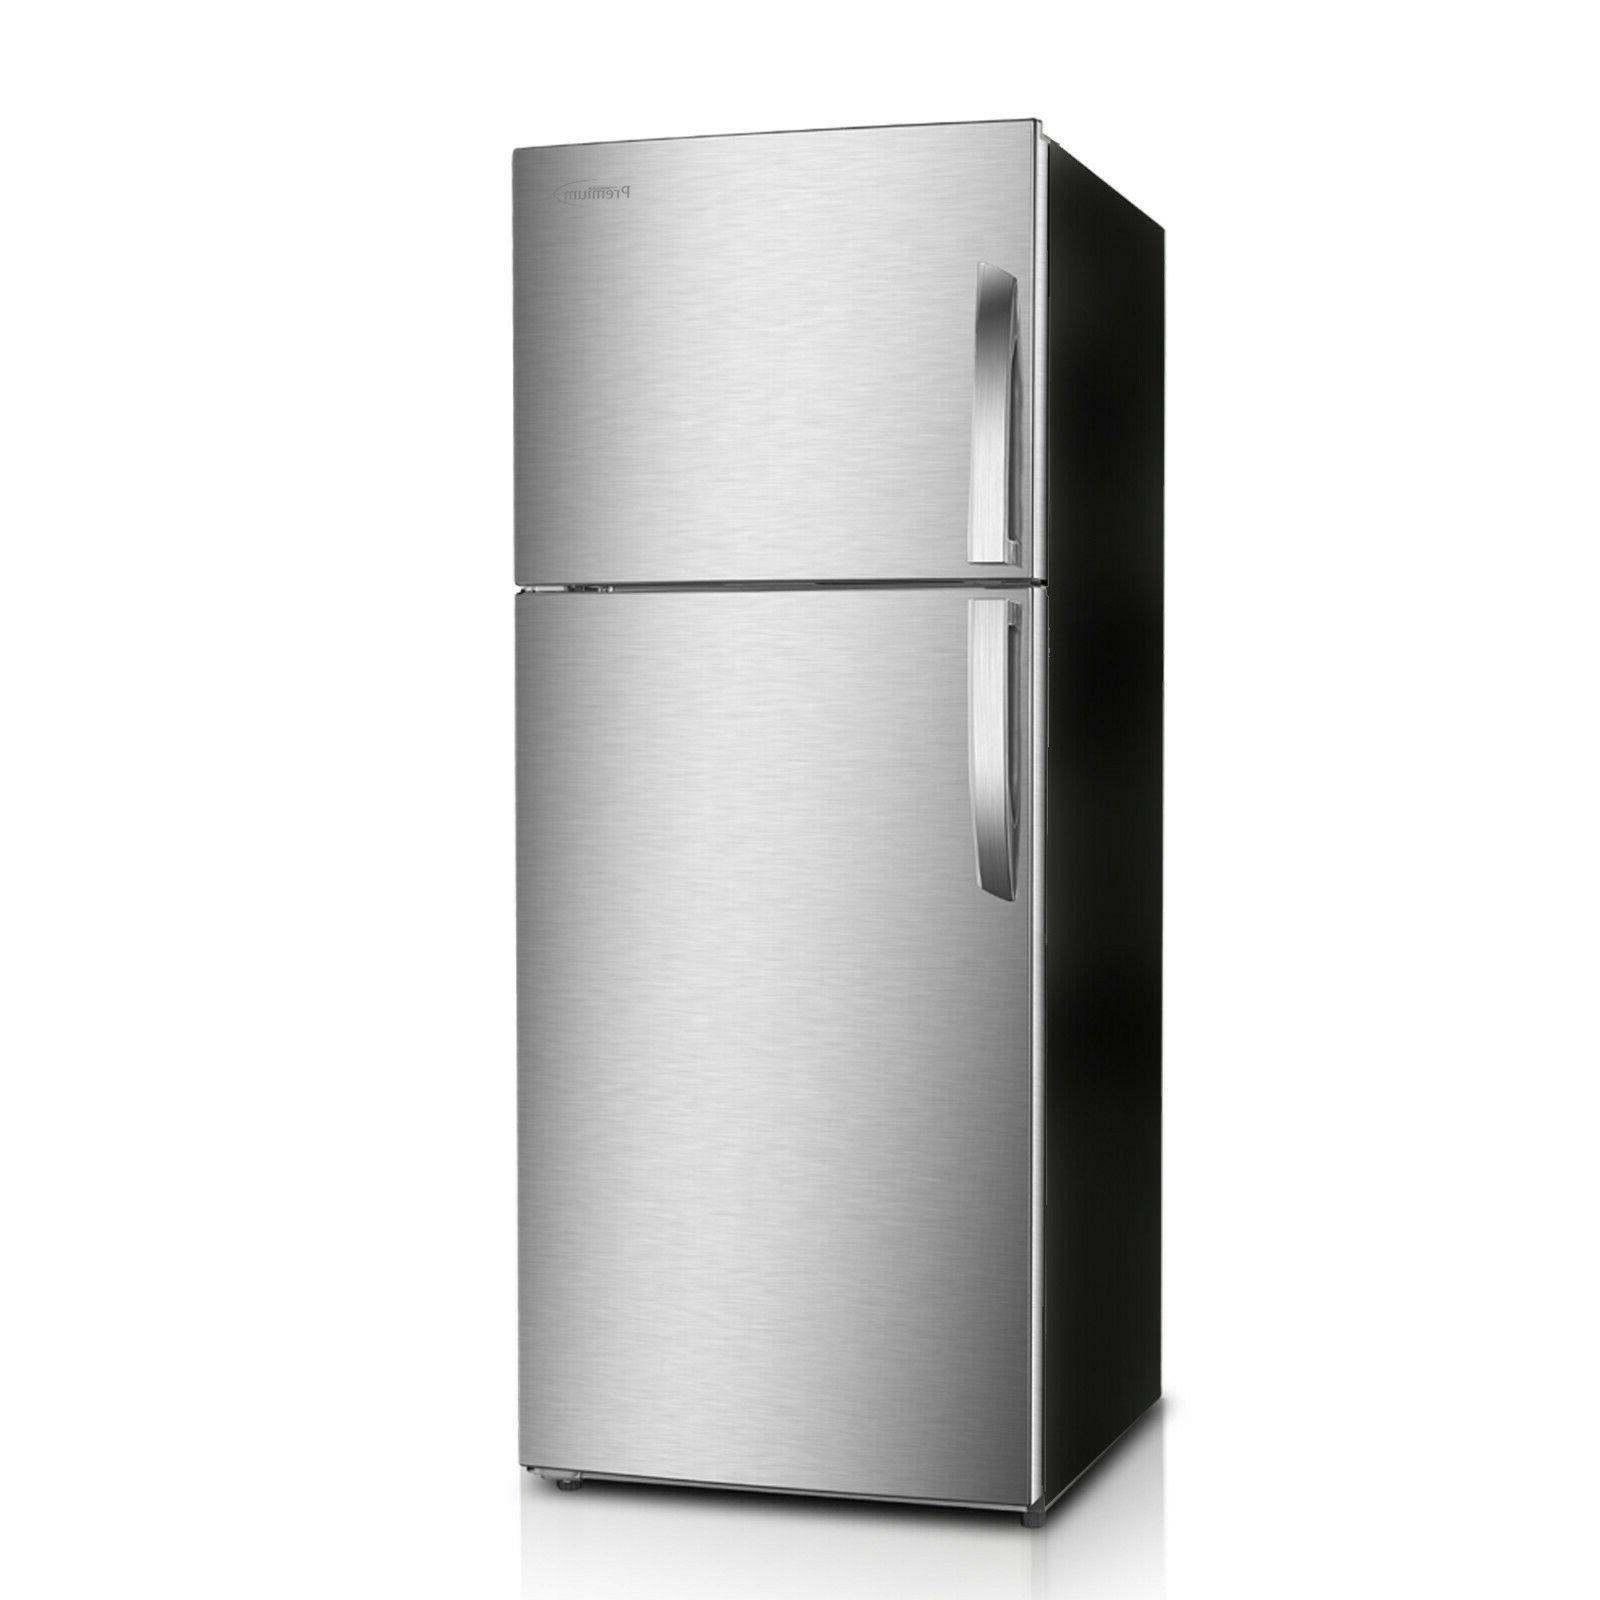 12 cu ft frost free top freezer